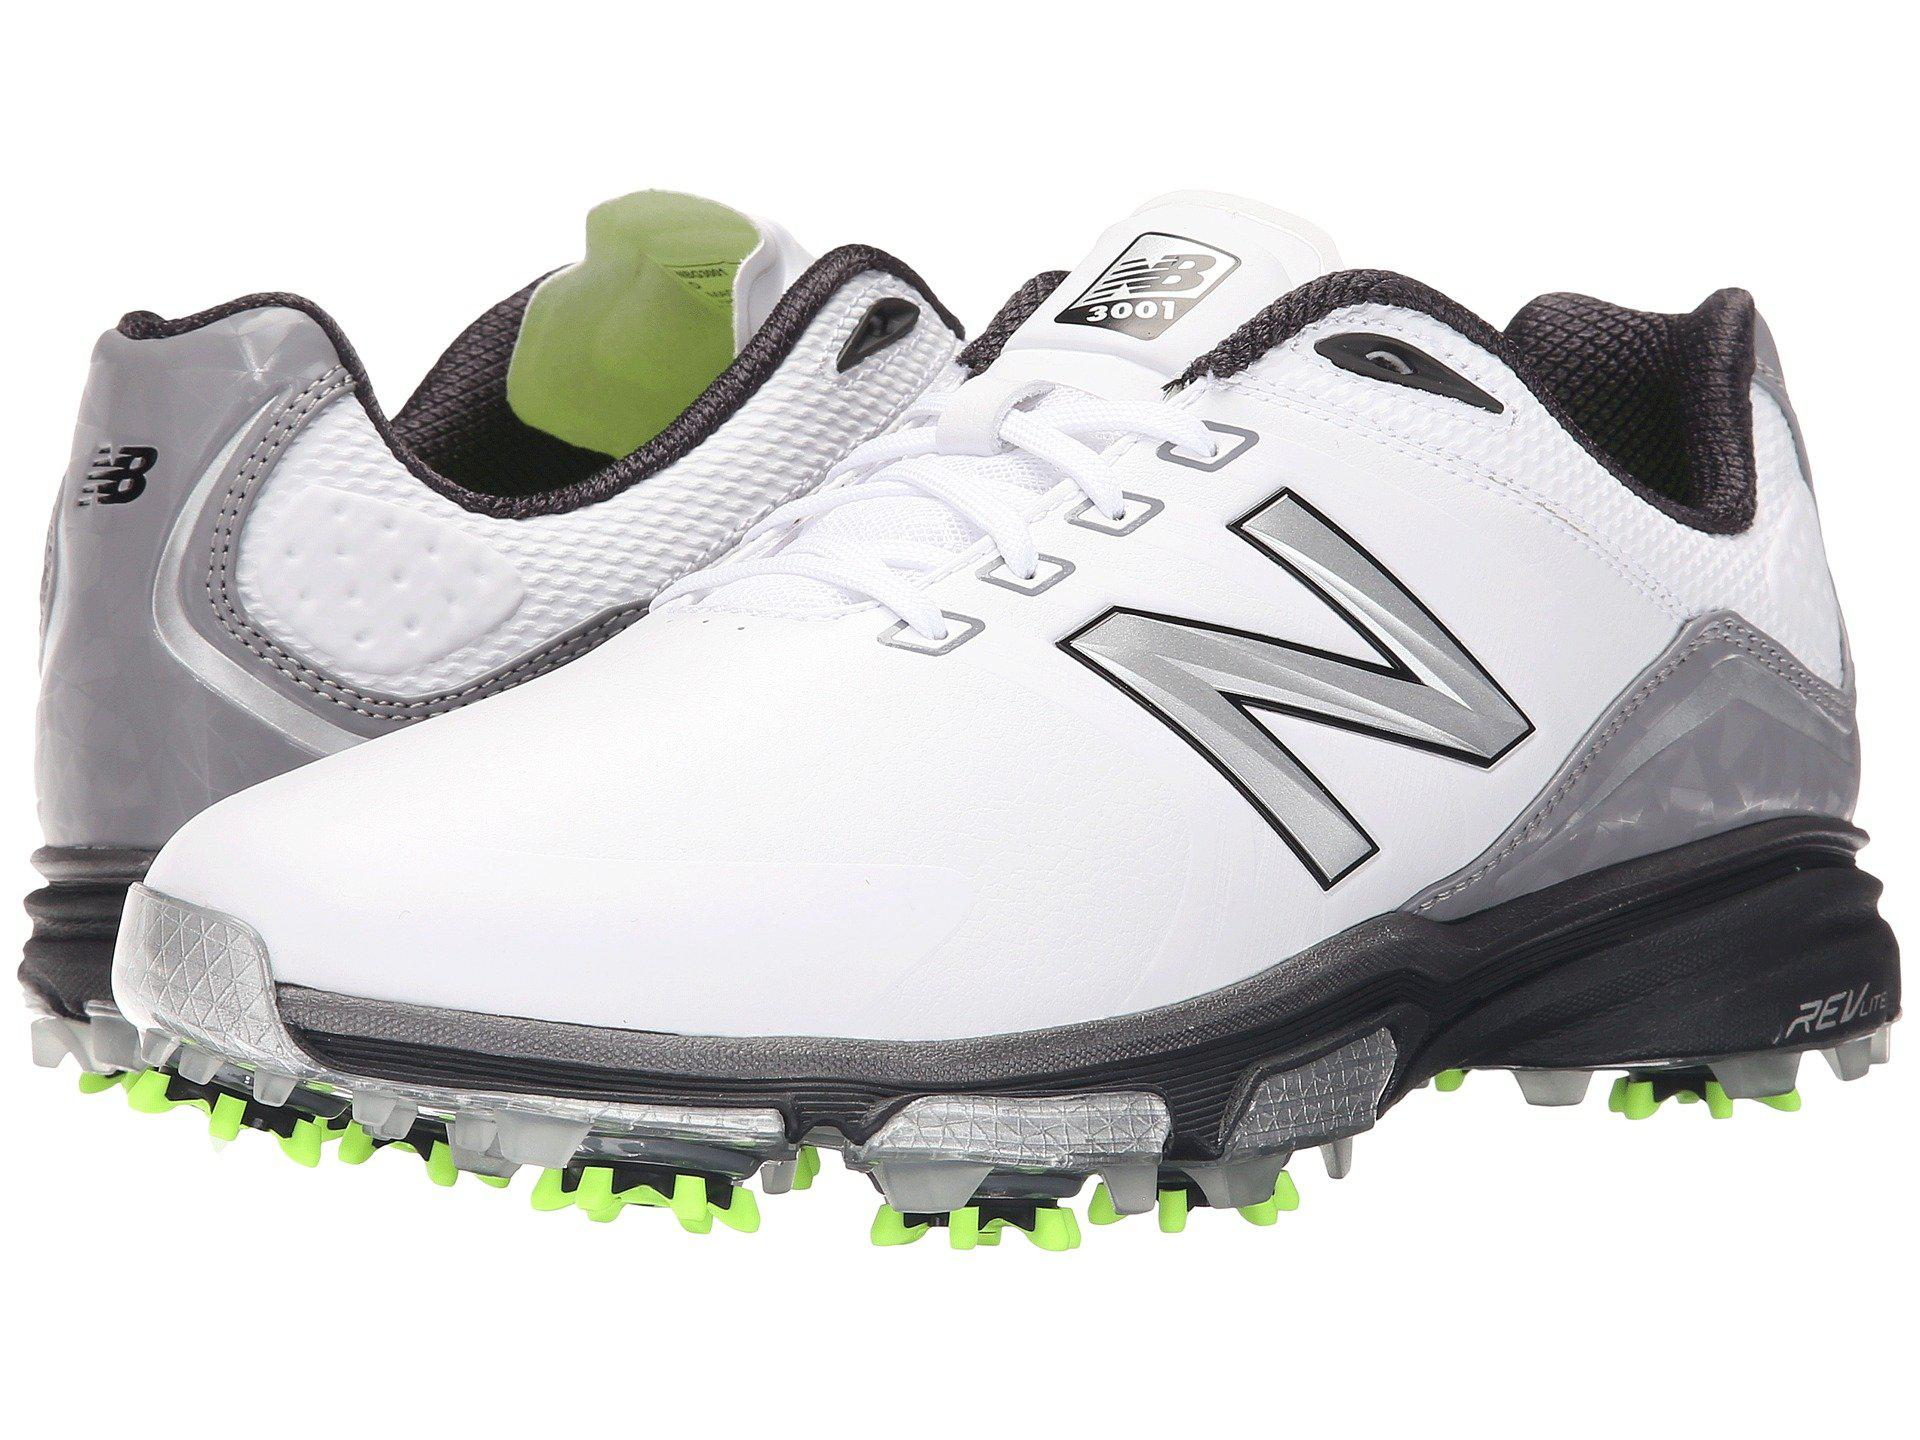 Lyst - New Balance Nbg3001 (white/black) Men's Golf Shoes ...